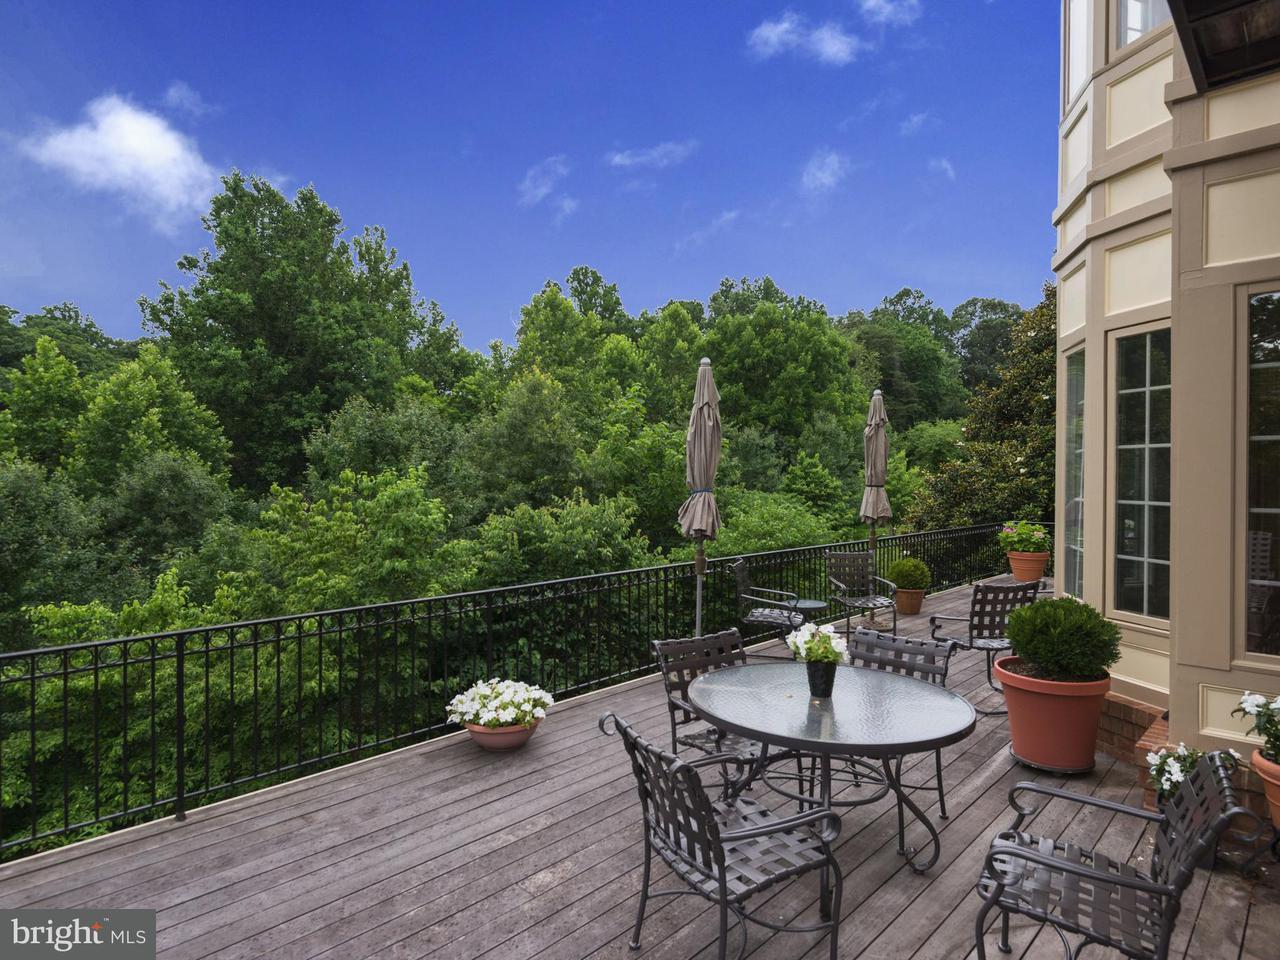 Single Family Home for Sale at 9708 BEMAN WOODS WAY 9708 BEMAN WOODS WAY Potomac, Maryland 20854 United States